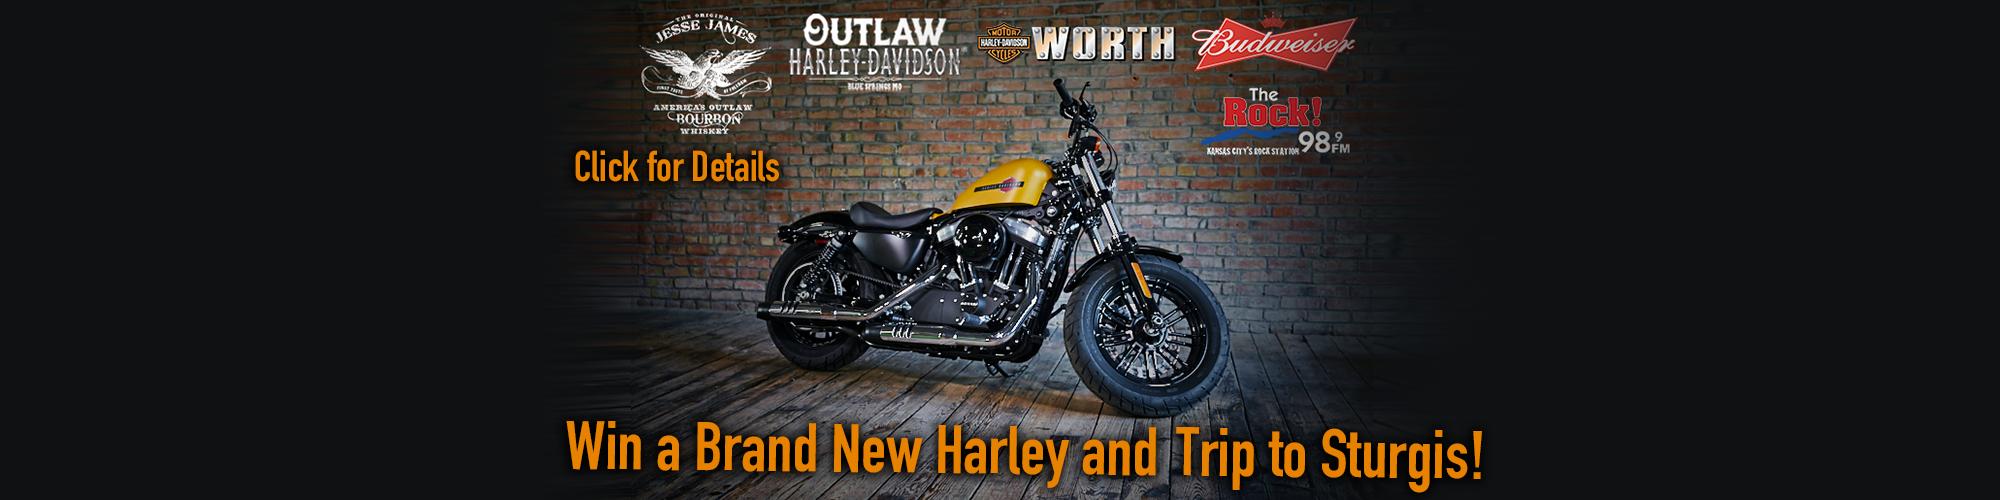 Kansas City - Win a new Harley-Davidson - 98.9